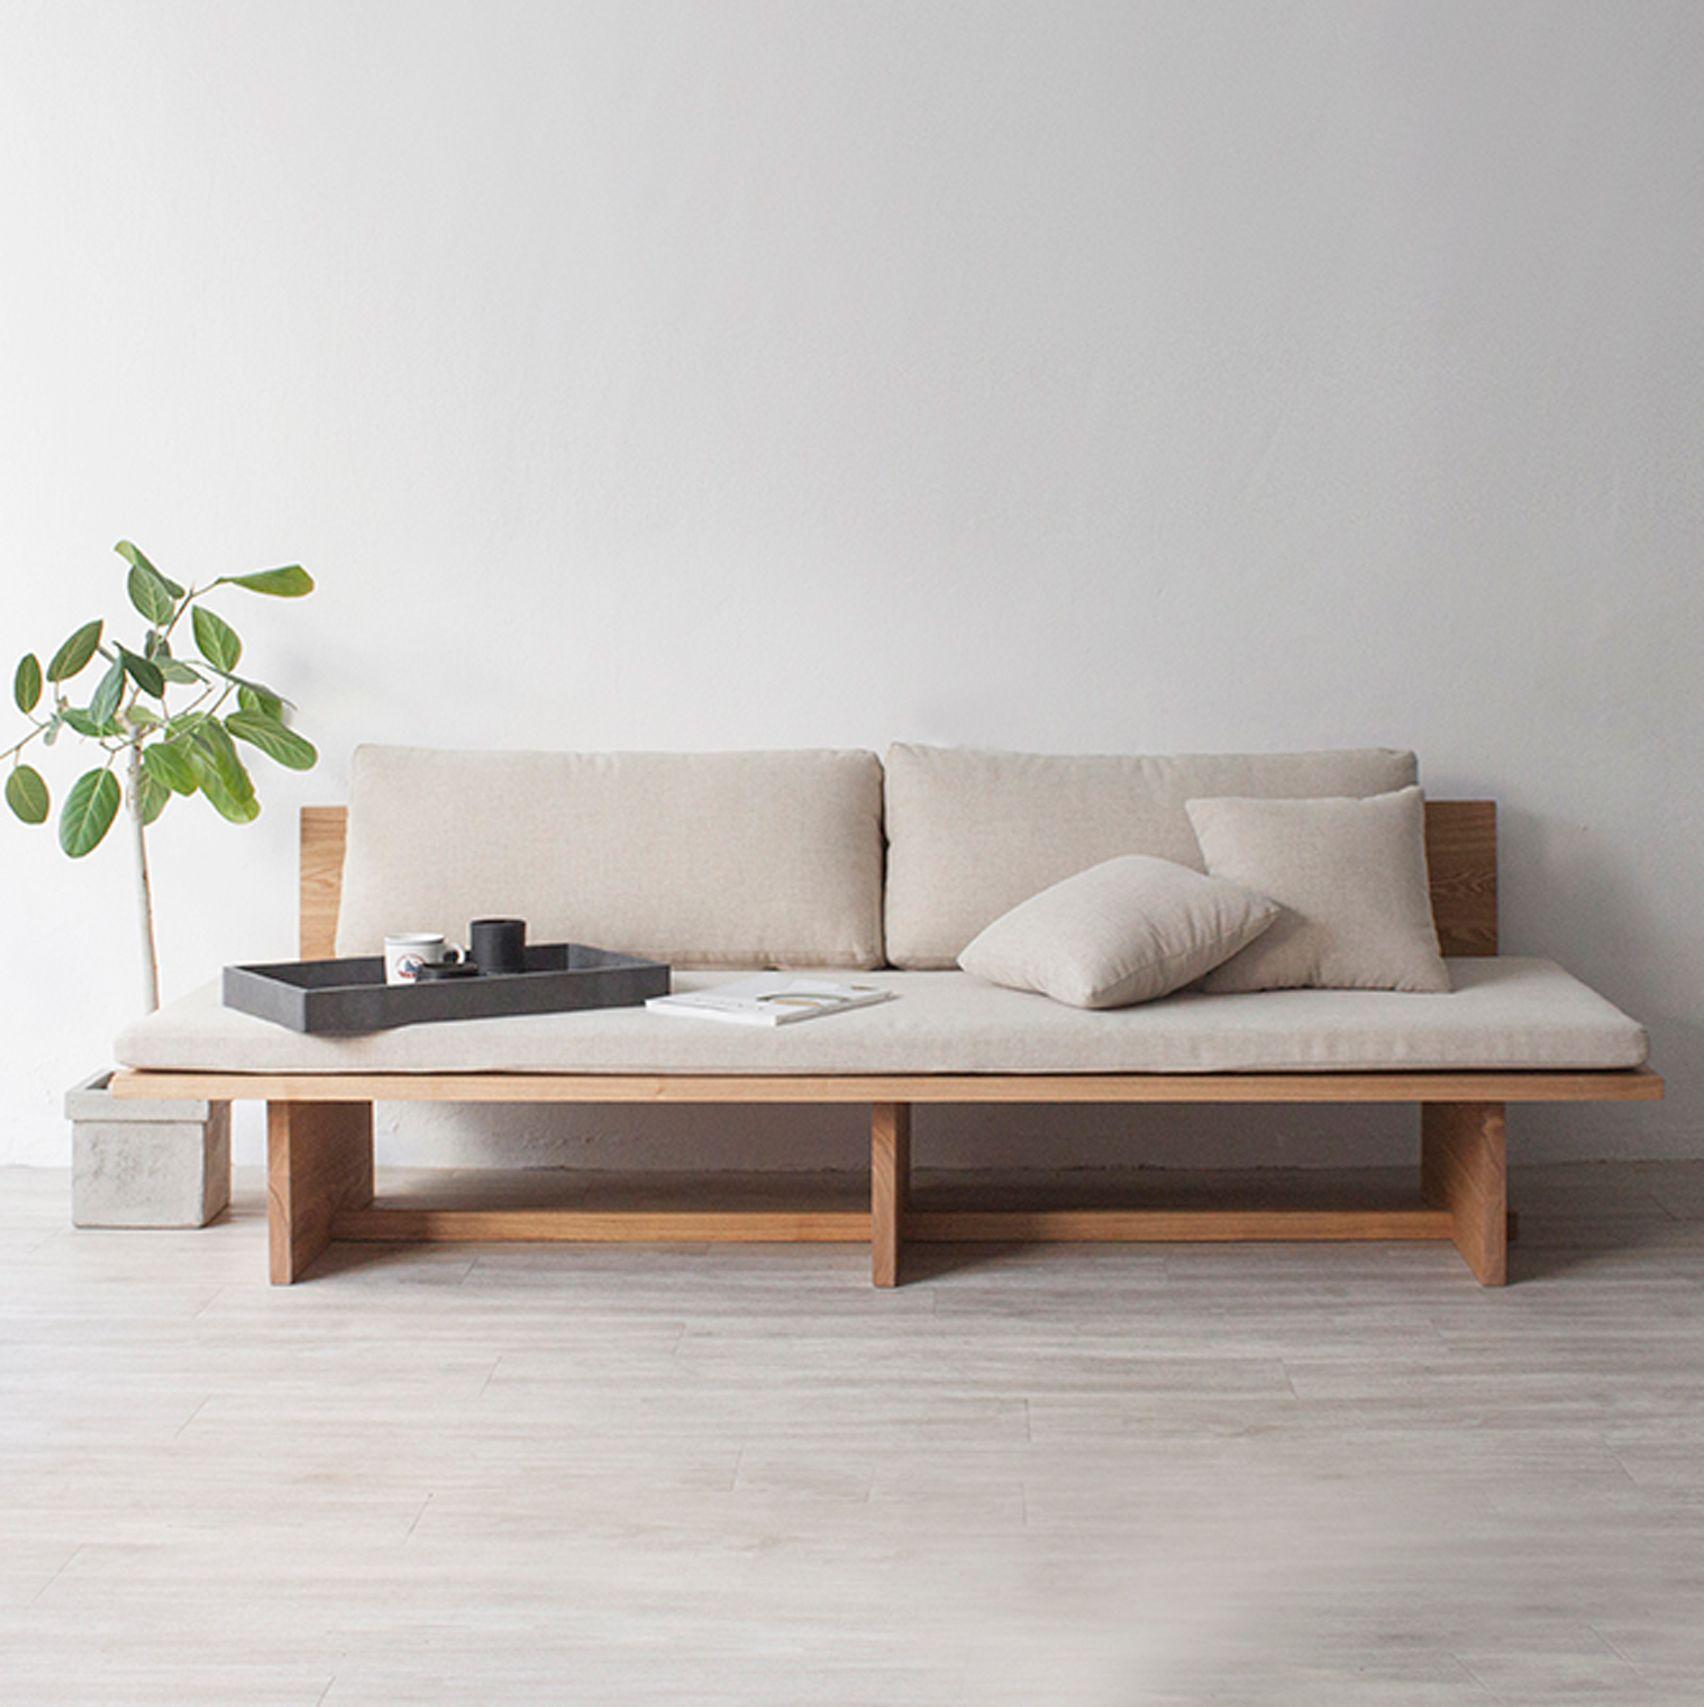 Korean Home Decor: Korean Designer Hyung Suk Cho's Blank Sofa Blends Features